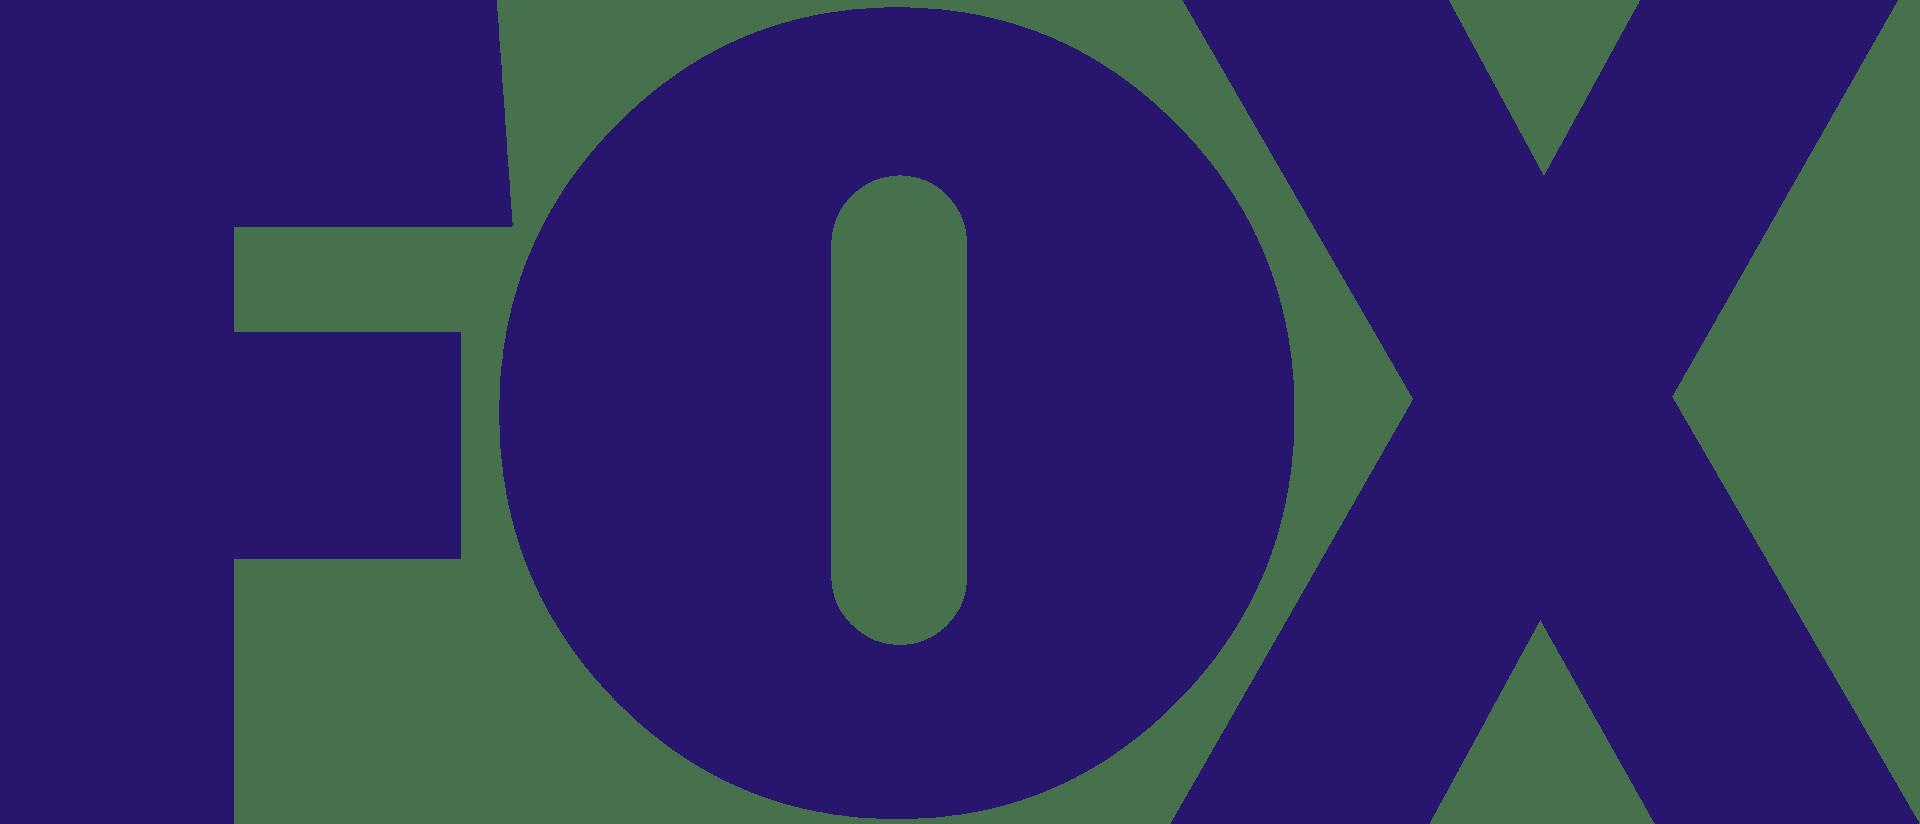 Fox_logo_indigo_Broadcasting_Company